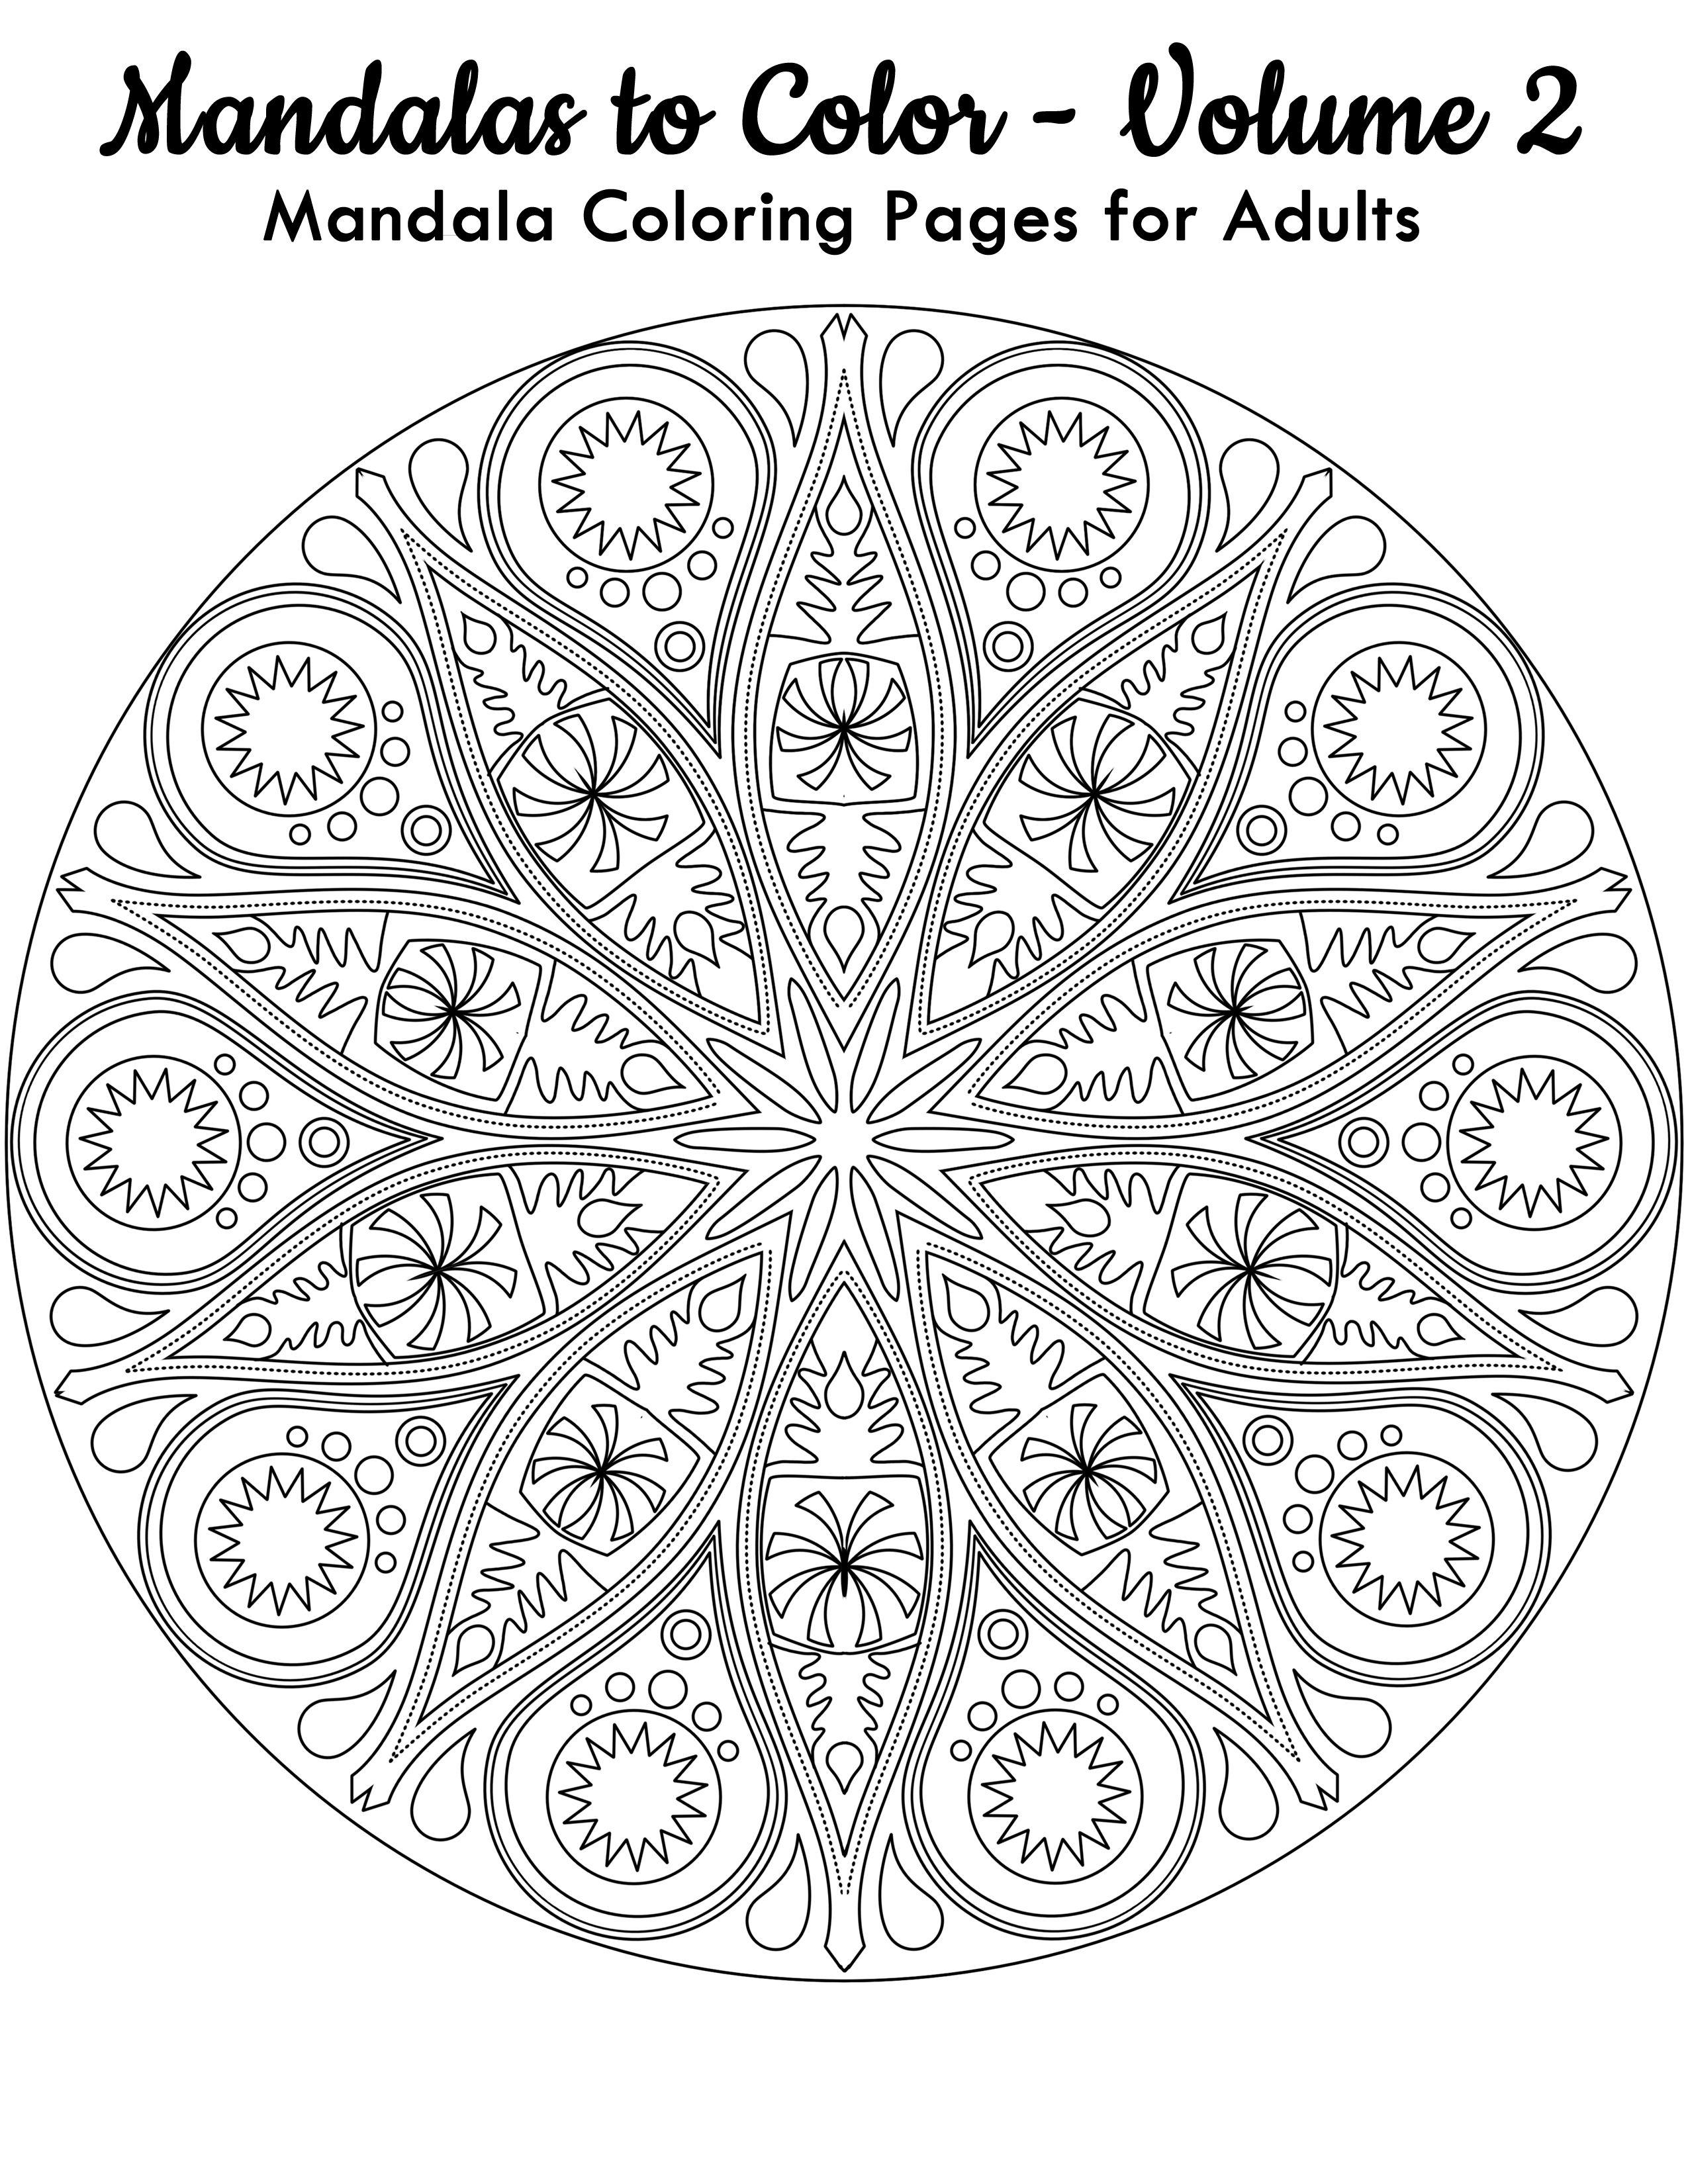 Have This Free Mandala Coloring Image From Mandalas To